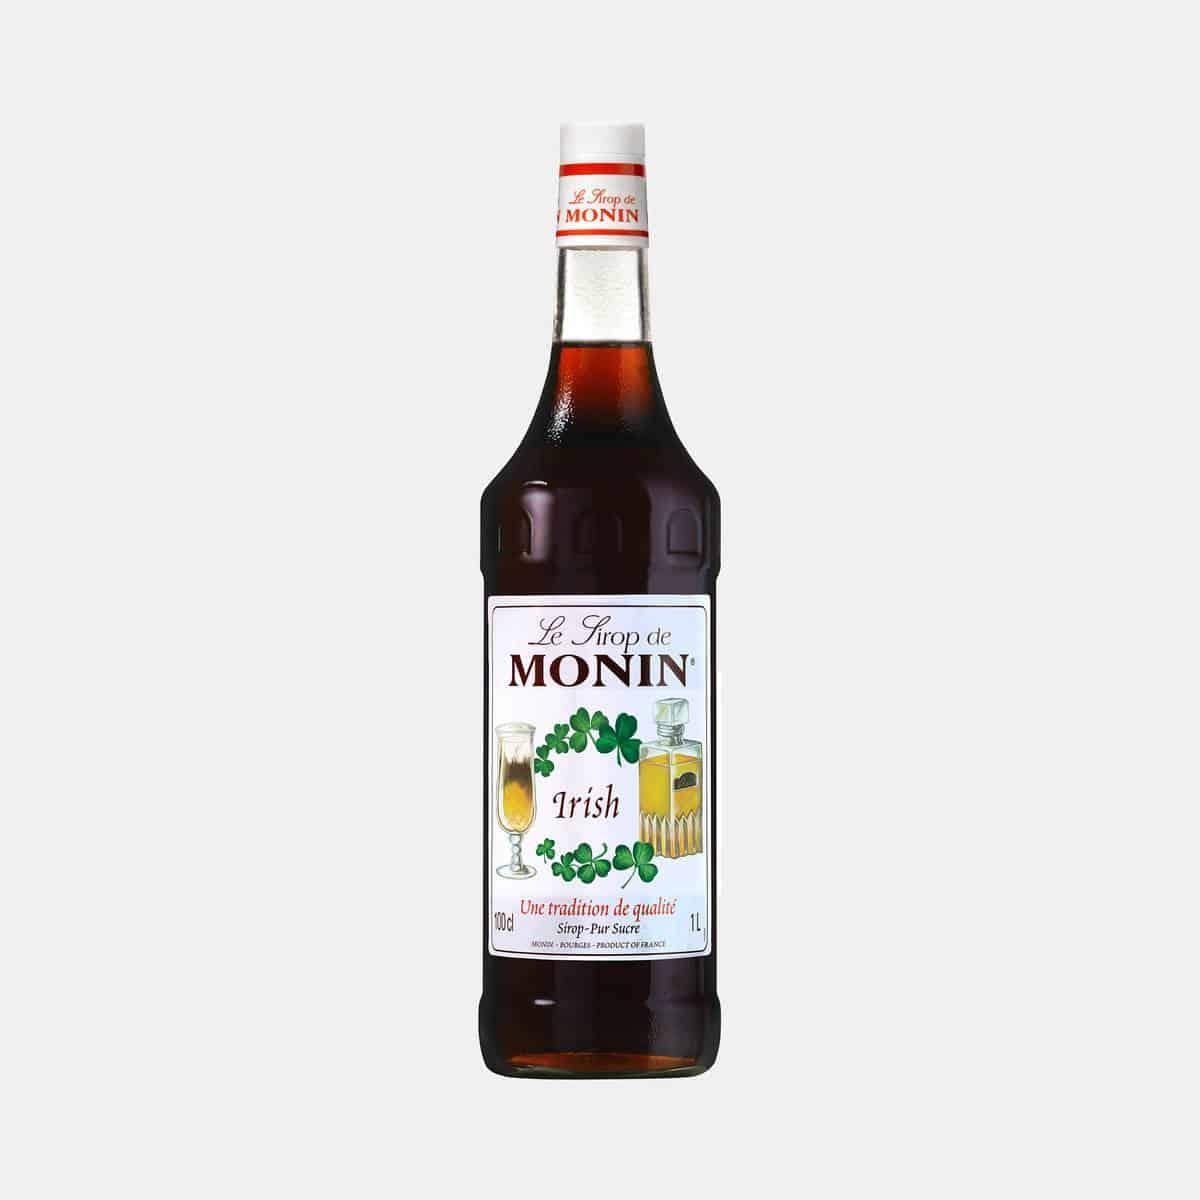 Monin Irish Syrup 1 Liter Glass Bottle